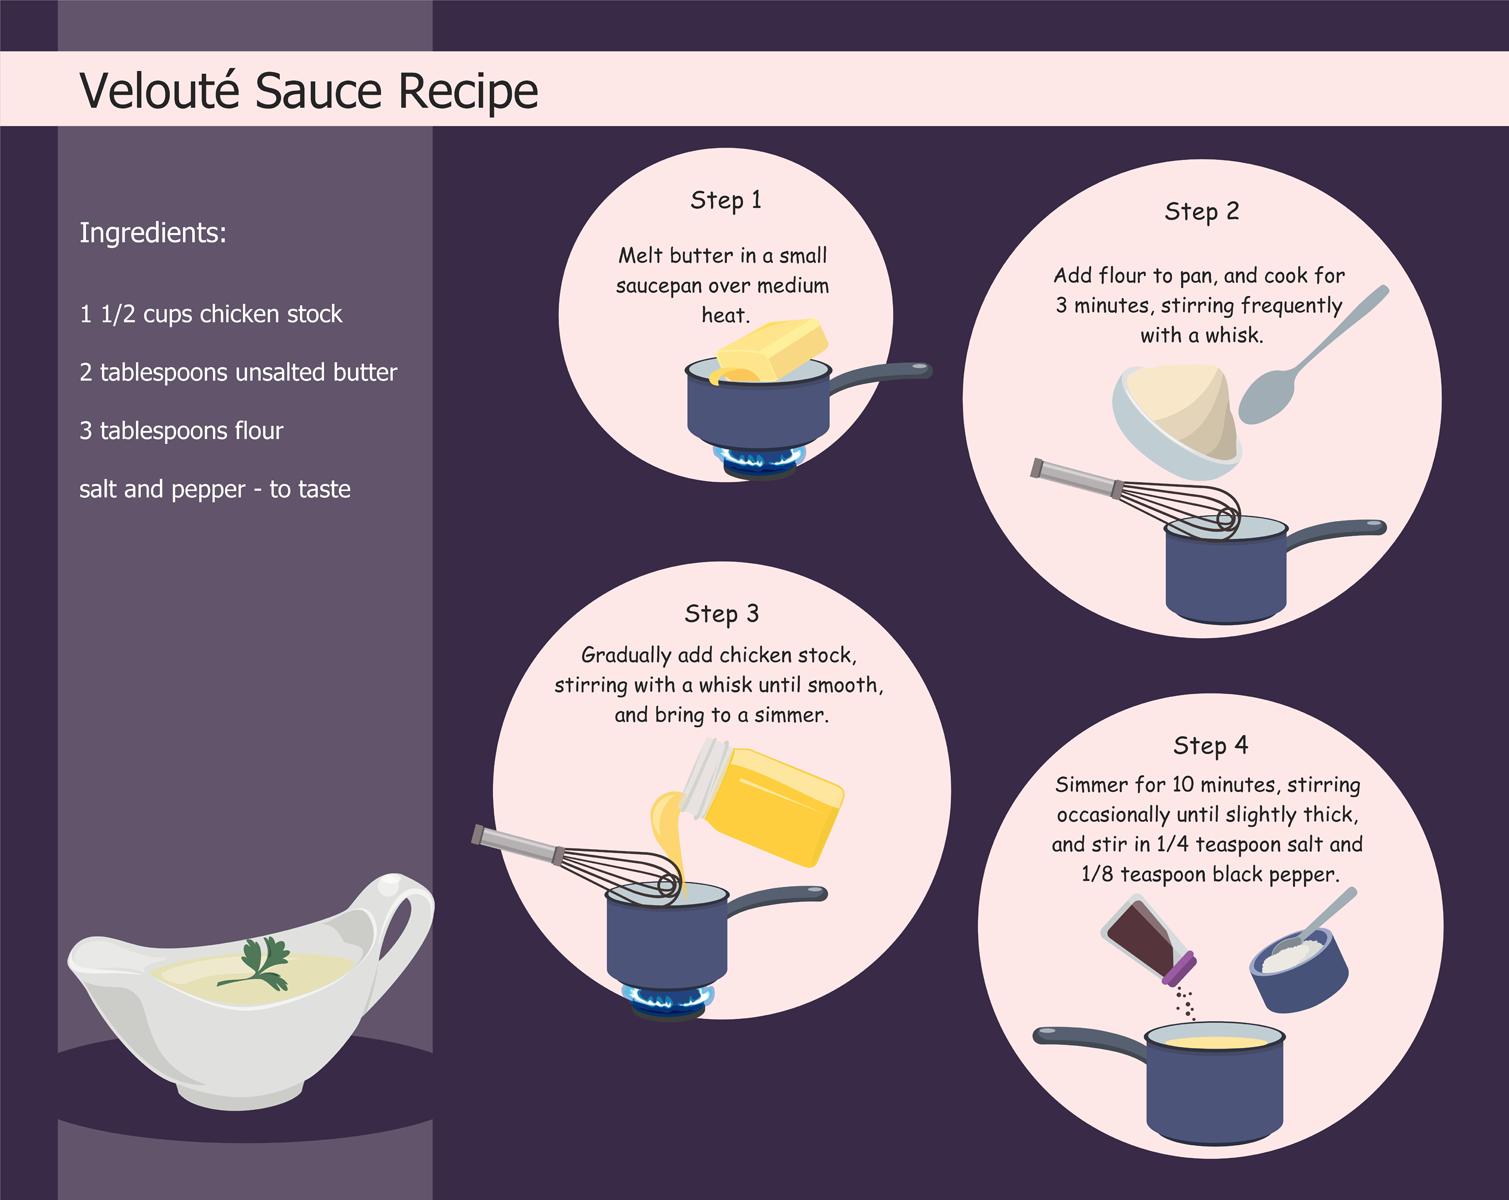 Veloute Sauce Recipe